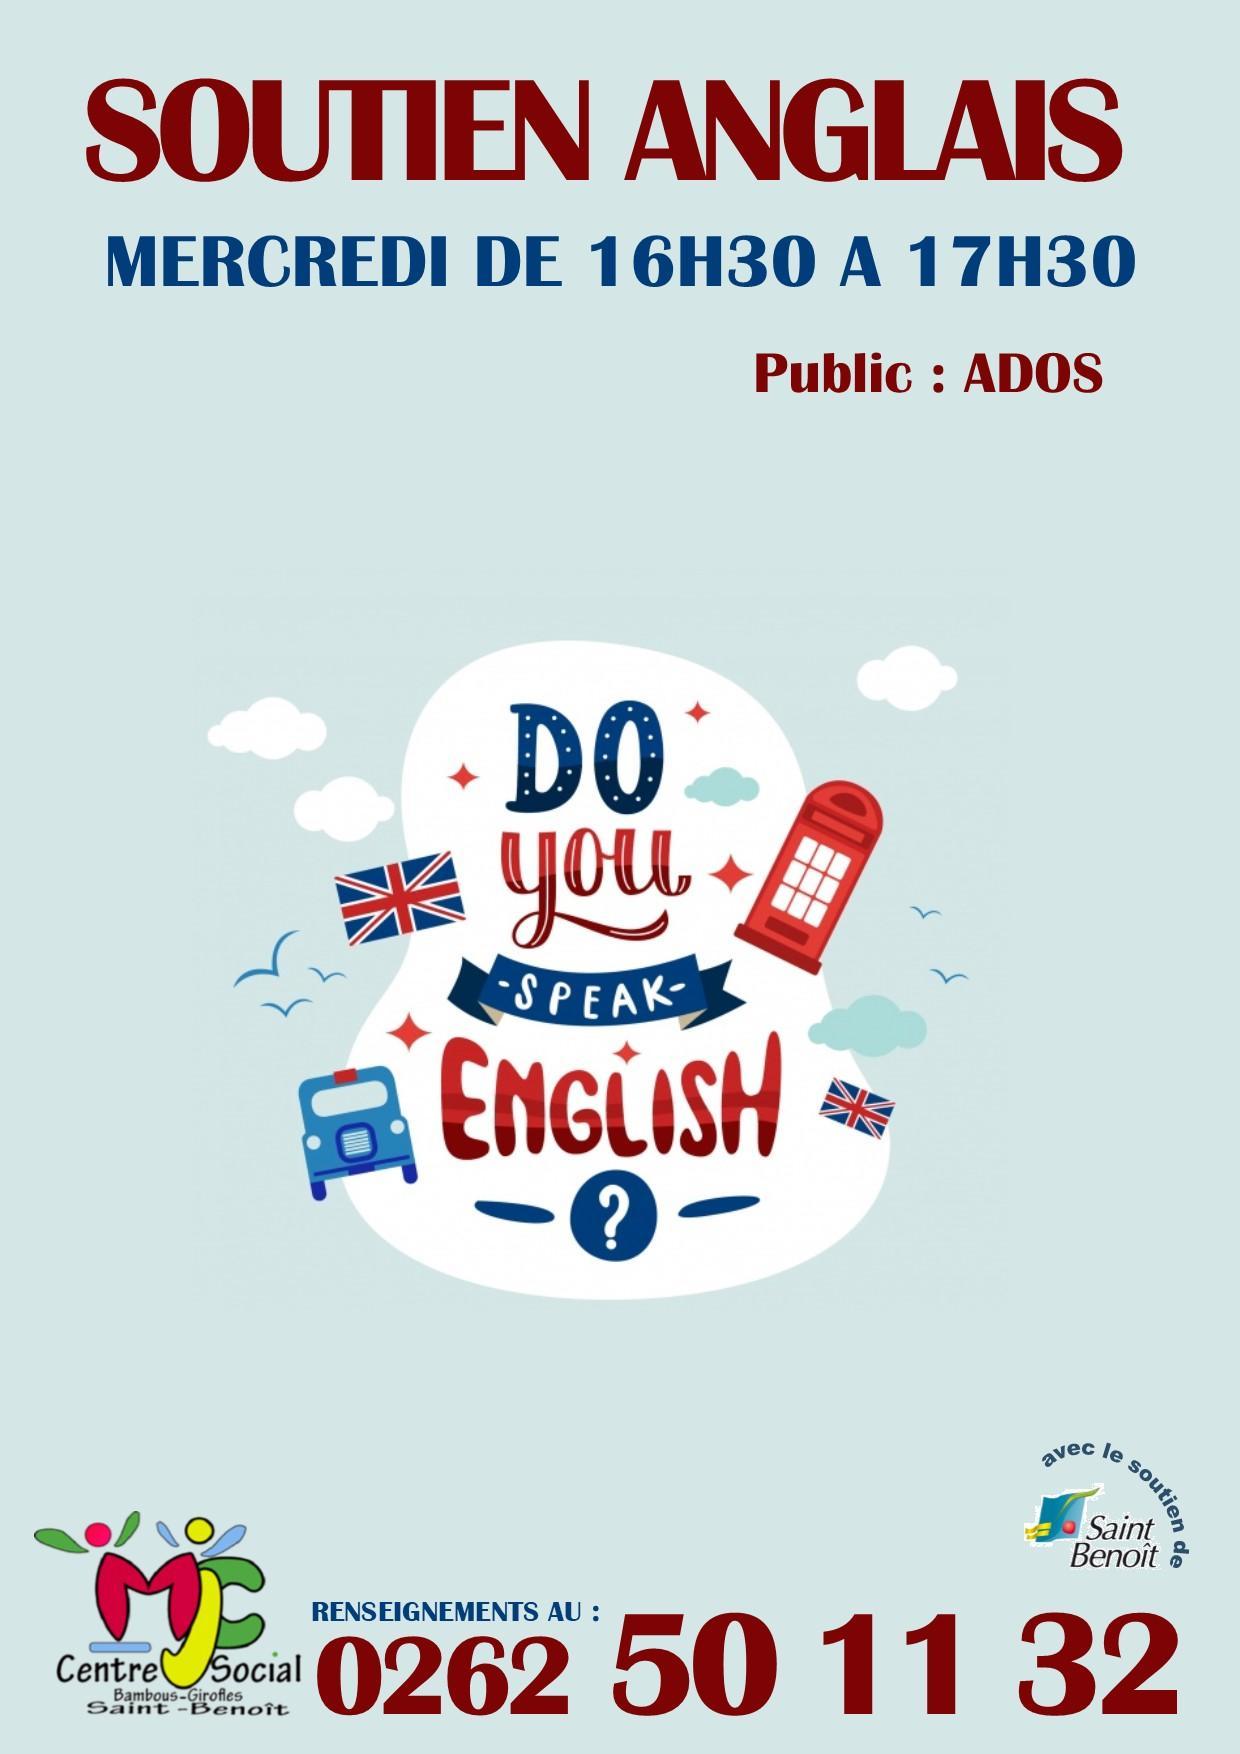 Soutien anglais